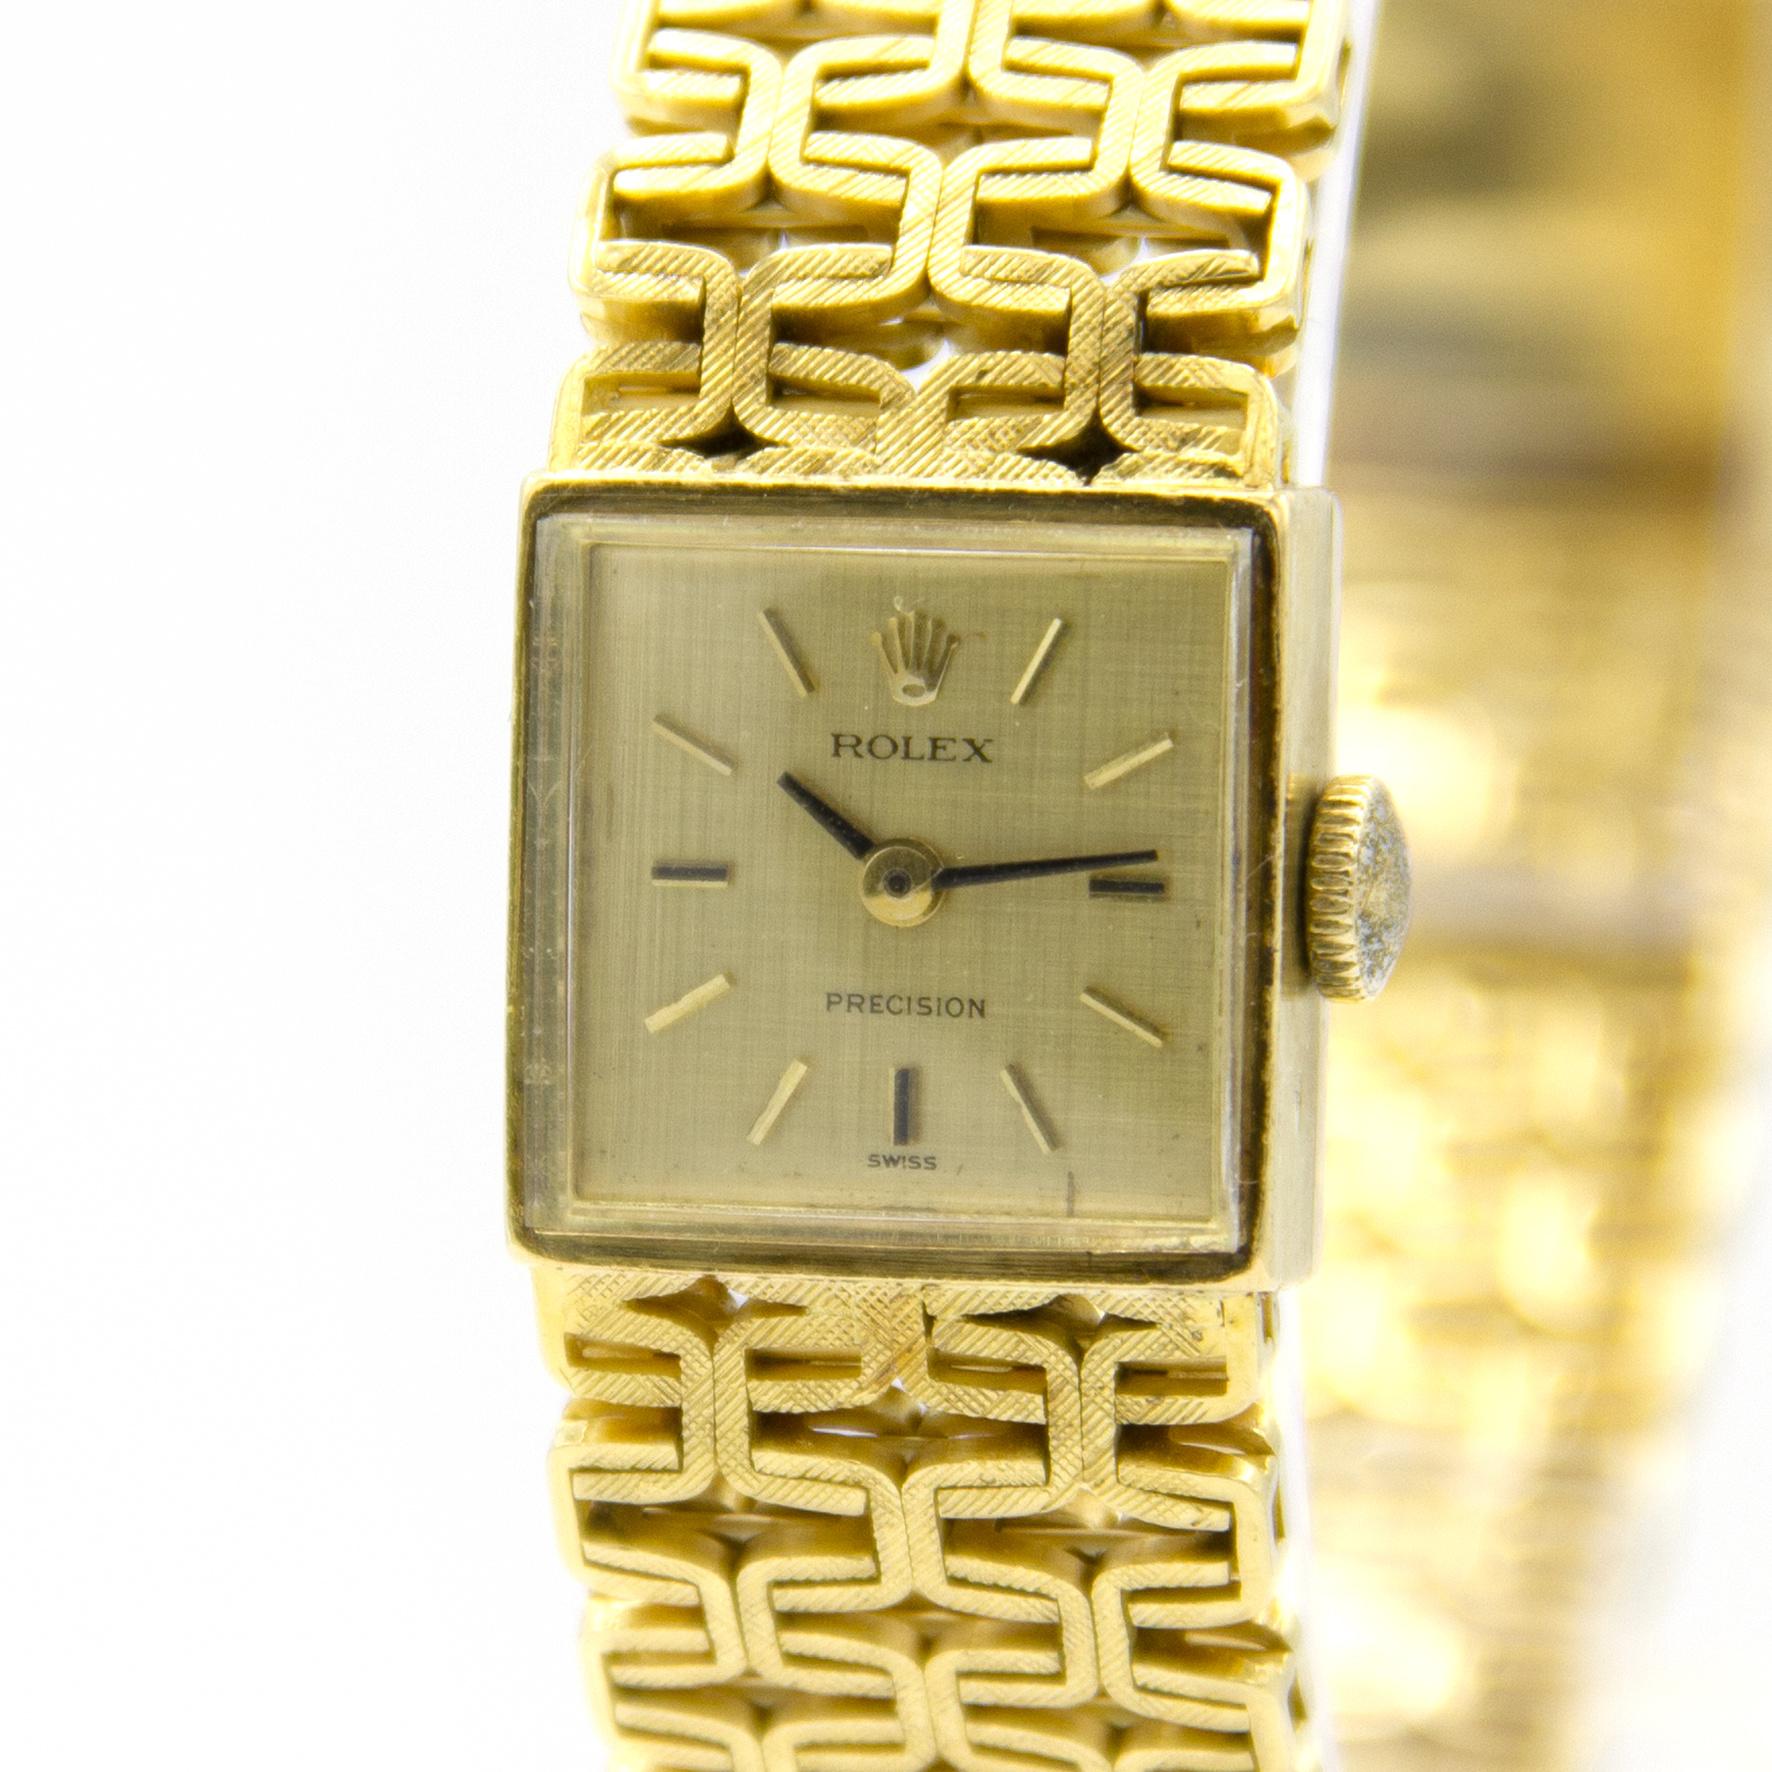 Rolex Precision -  Dames Horloge - 18 karaat geelgoud-2